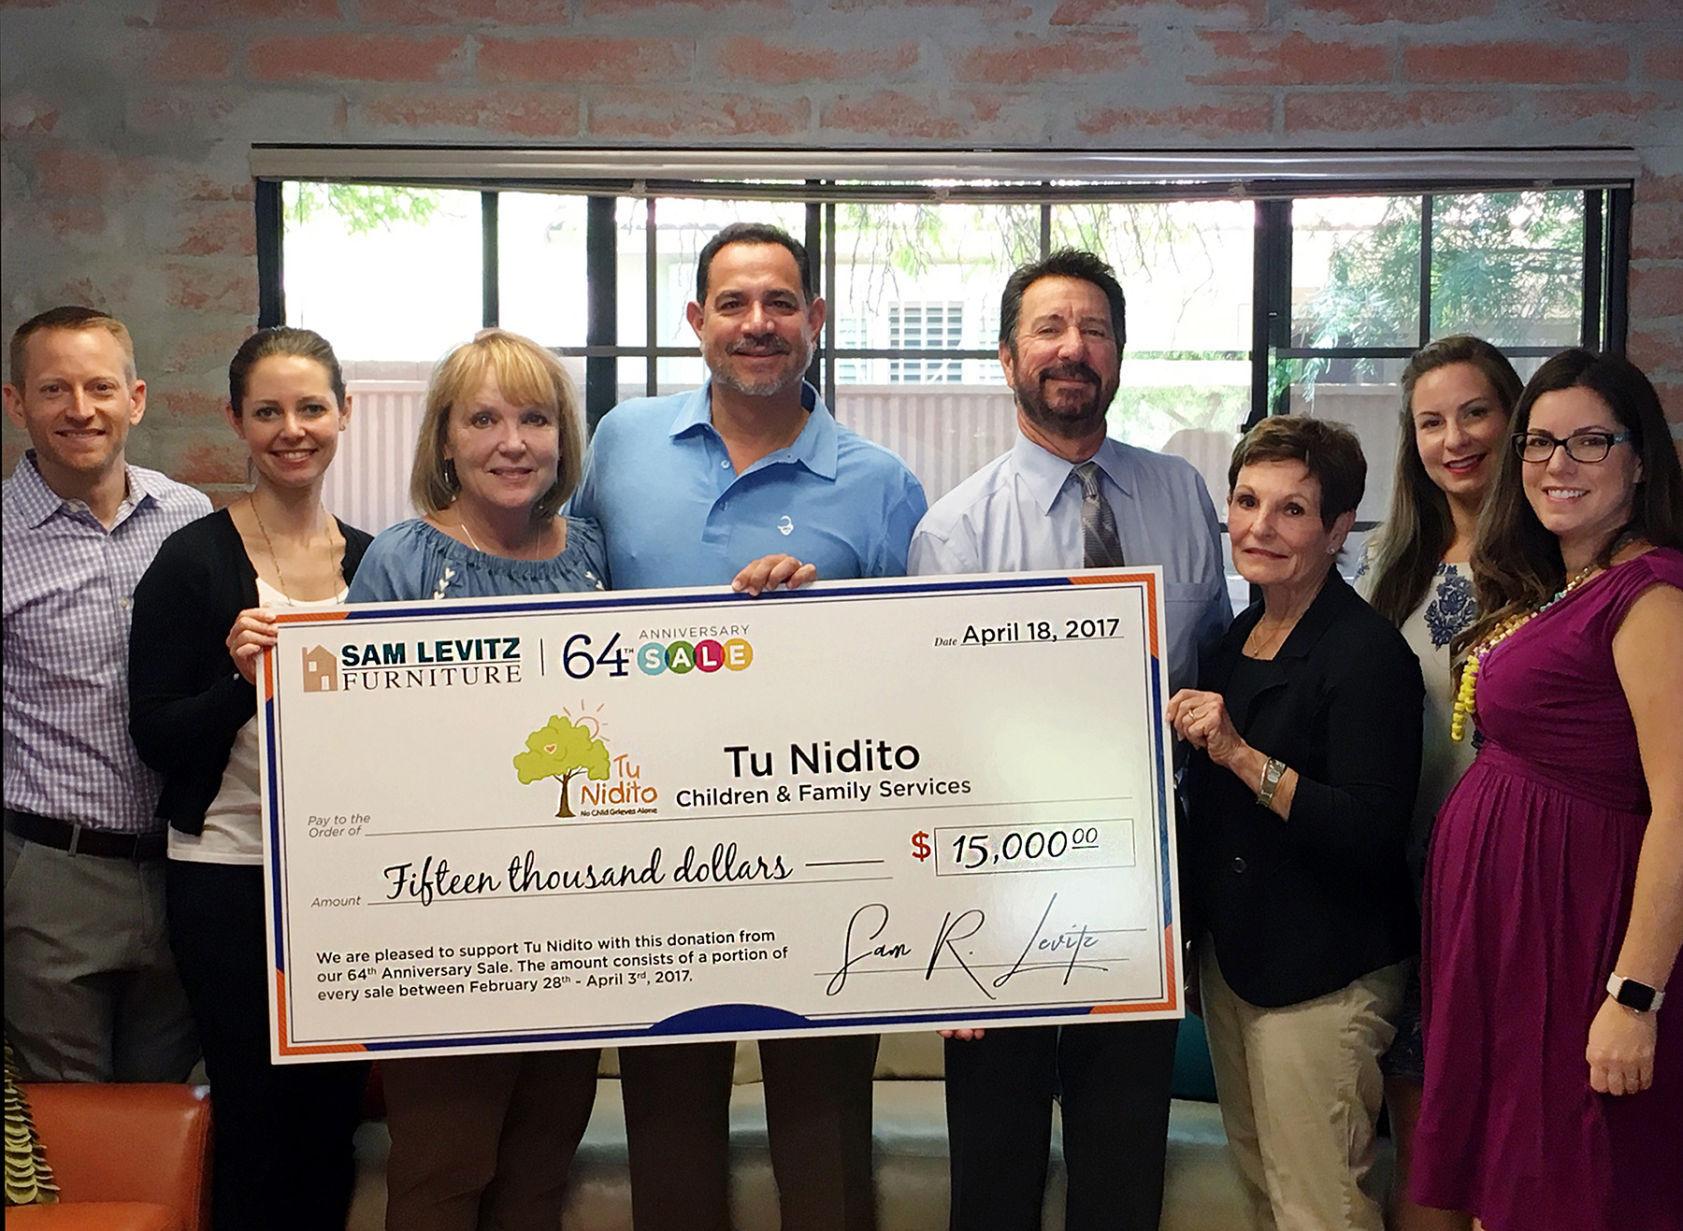 Sam Levitz Furniture Donates To Tu Nidito Tucson Com Arizona